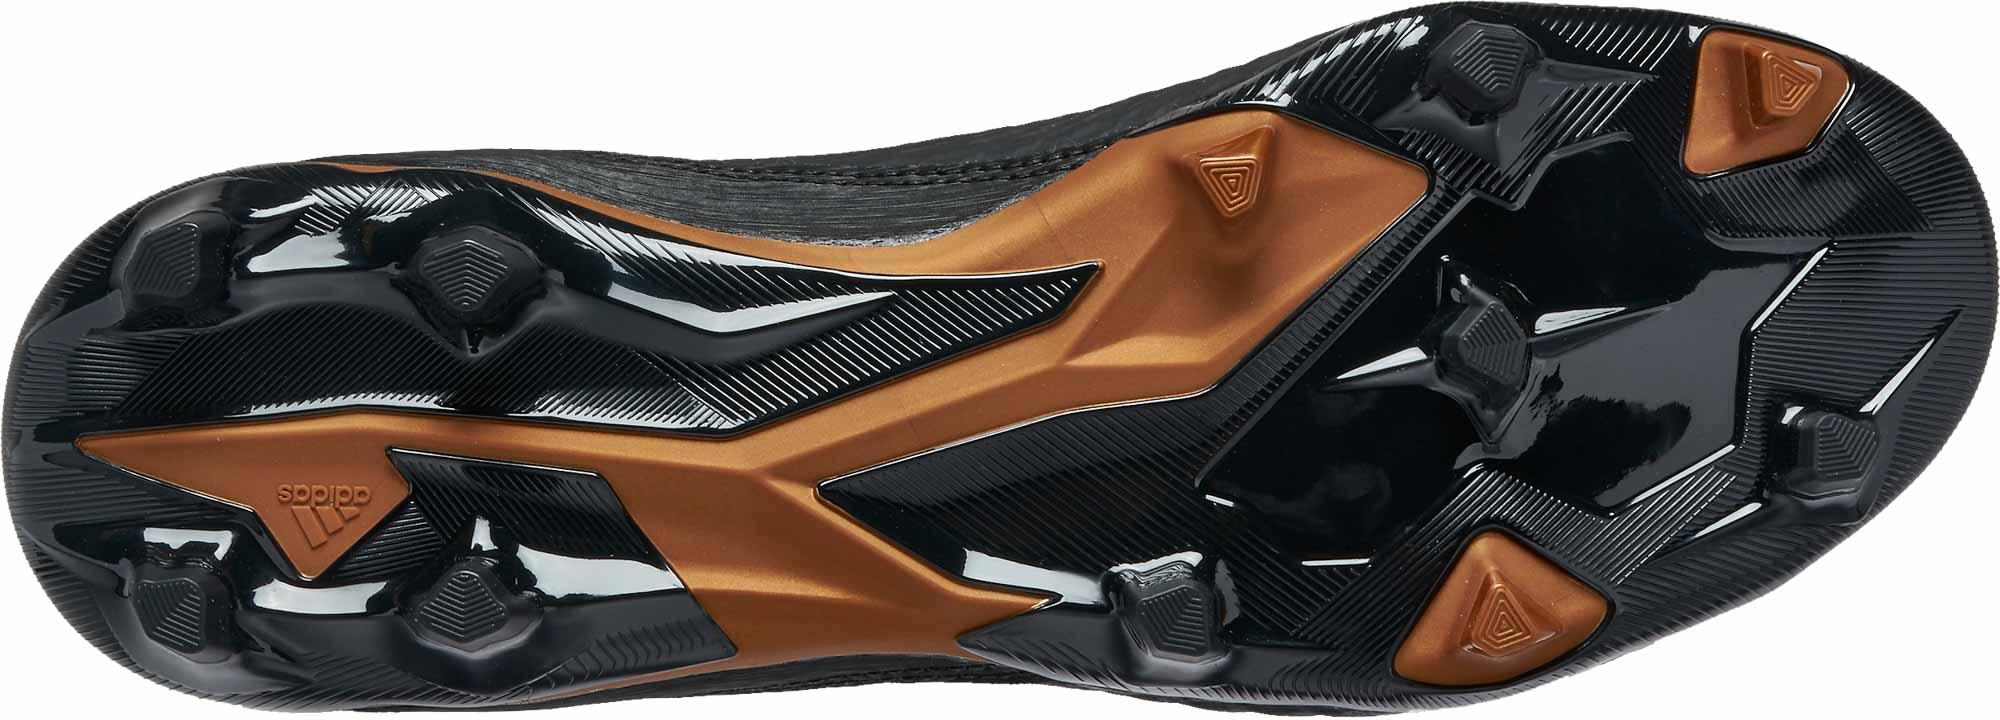 Adidas Predator Grapas 18.3 eDGOazXqh